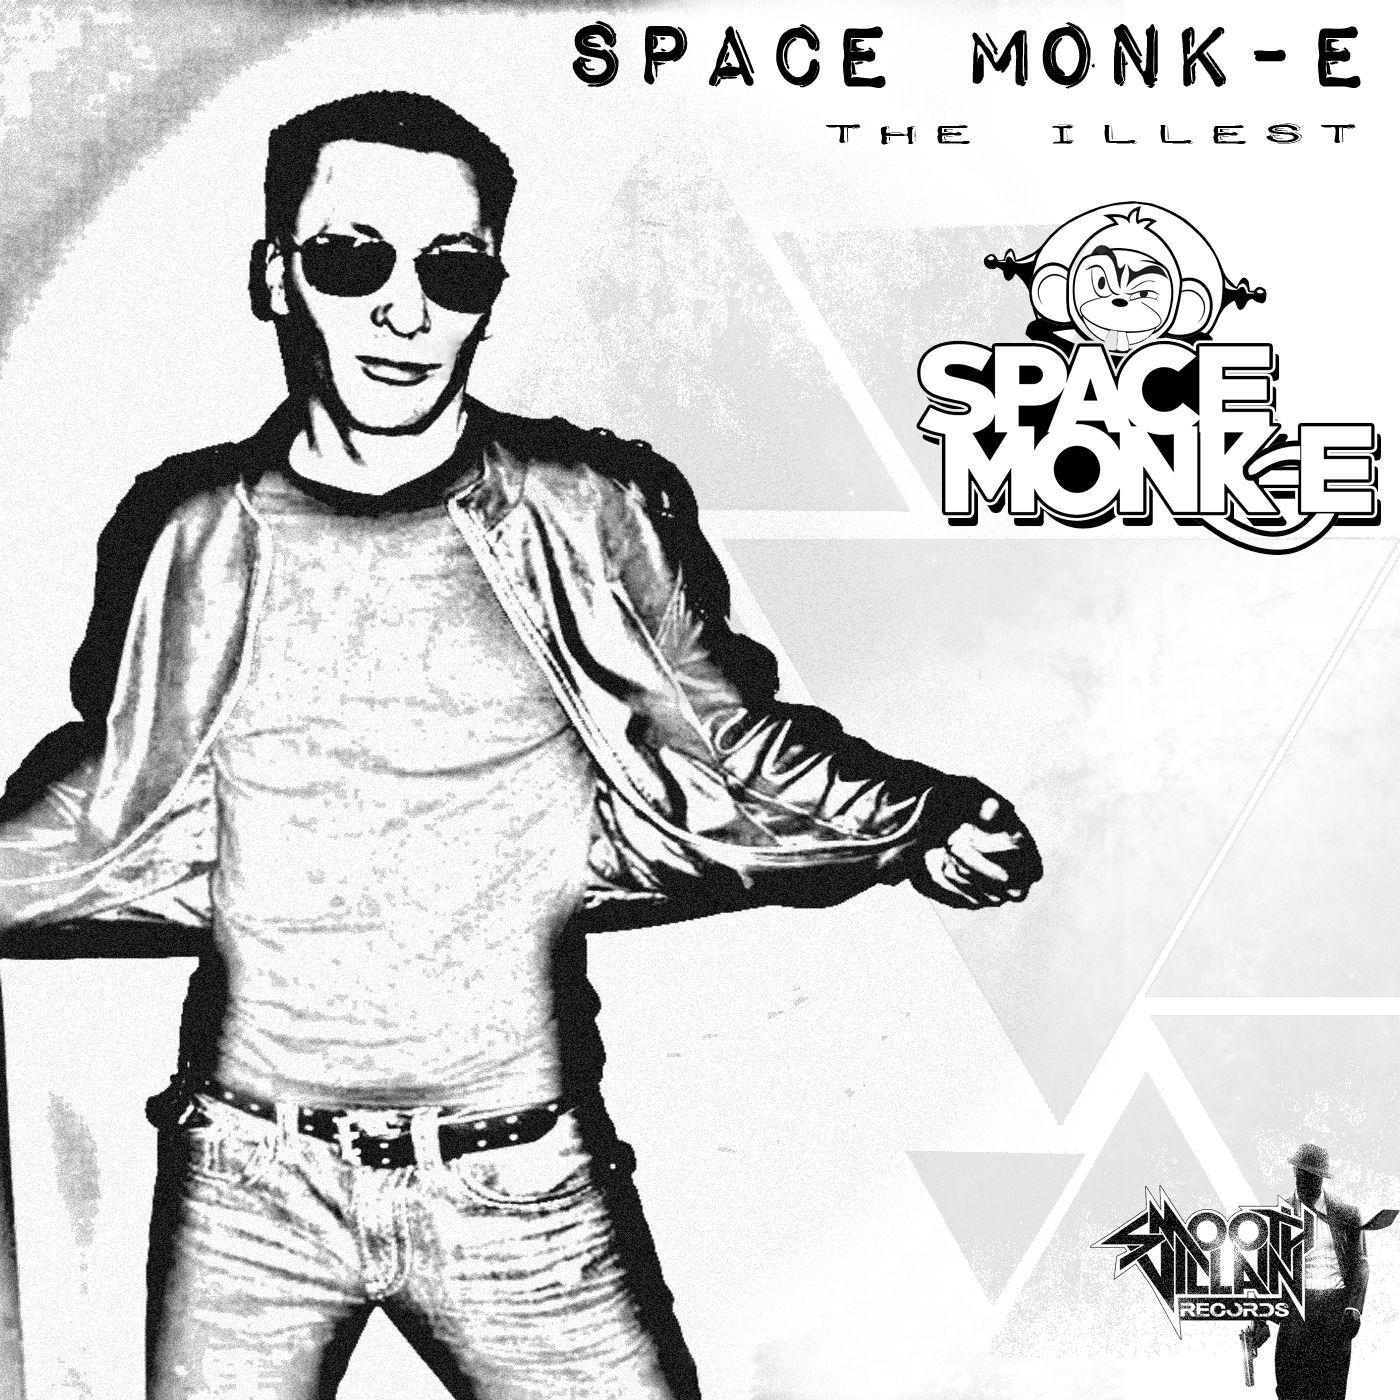 space_monk-e_-_the_illest.jpg